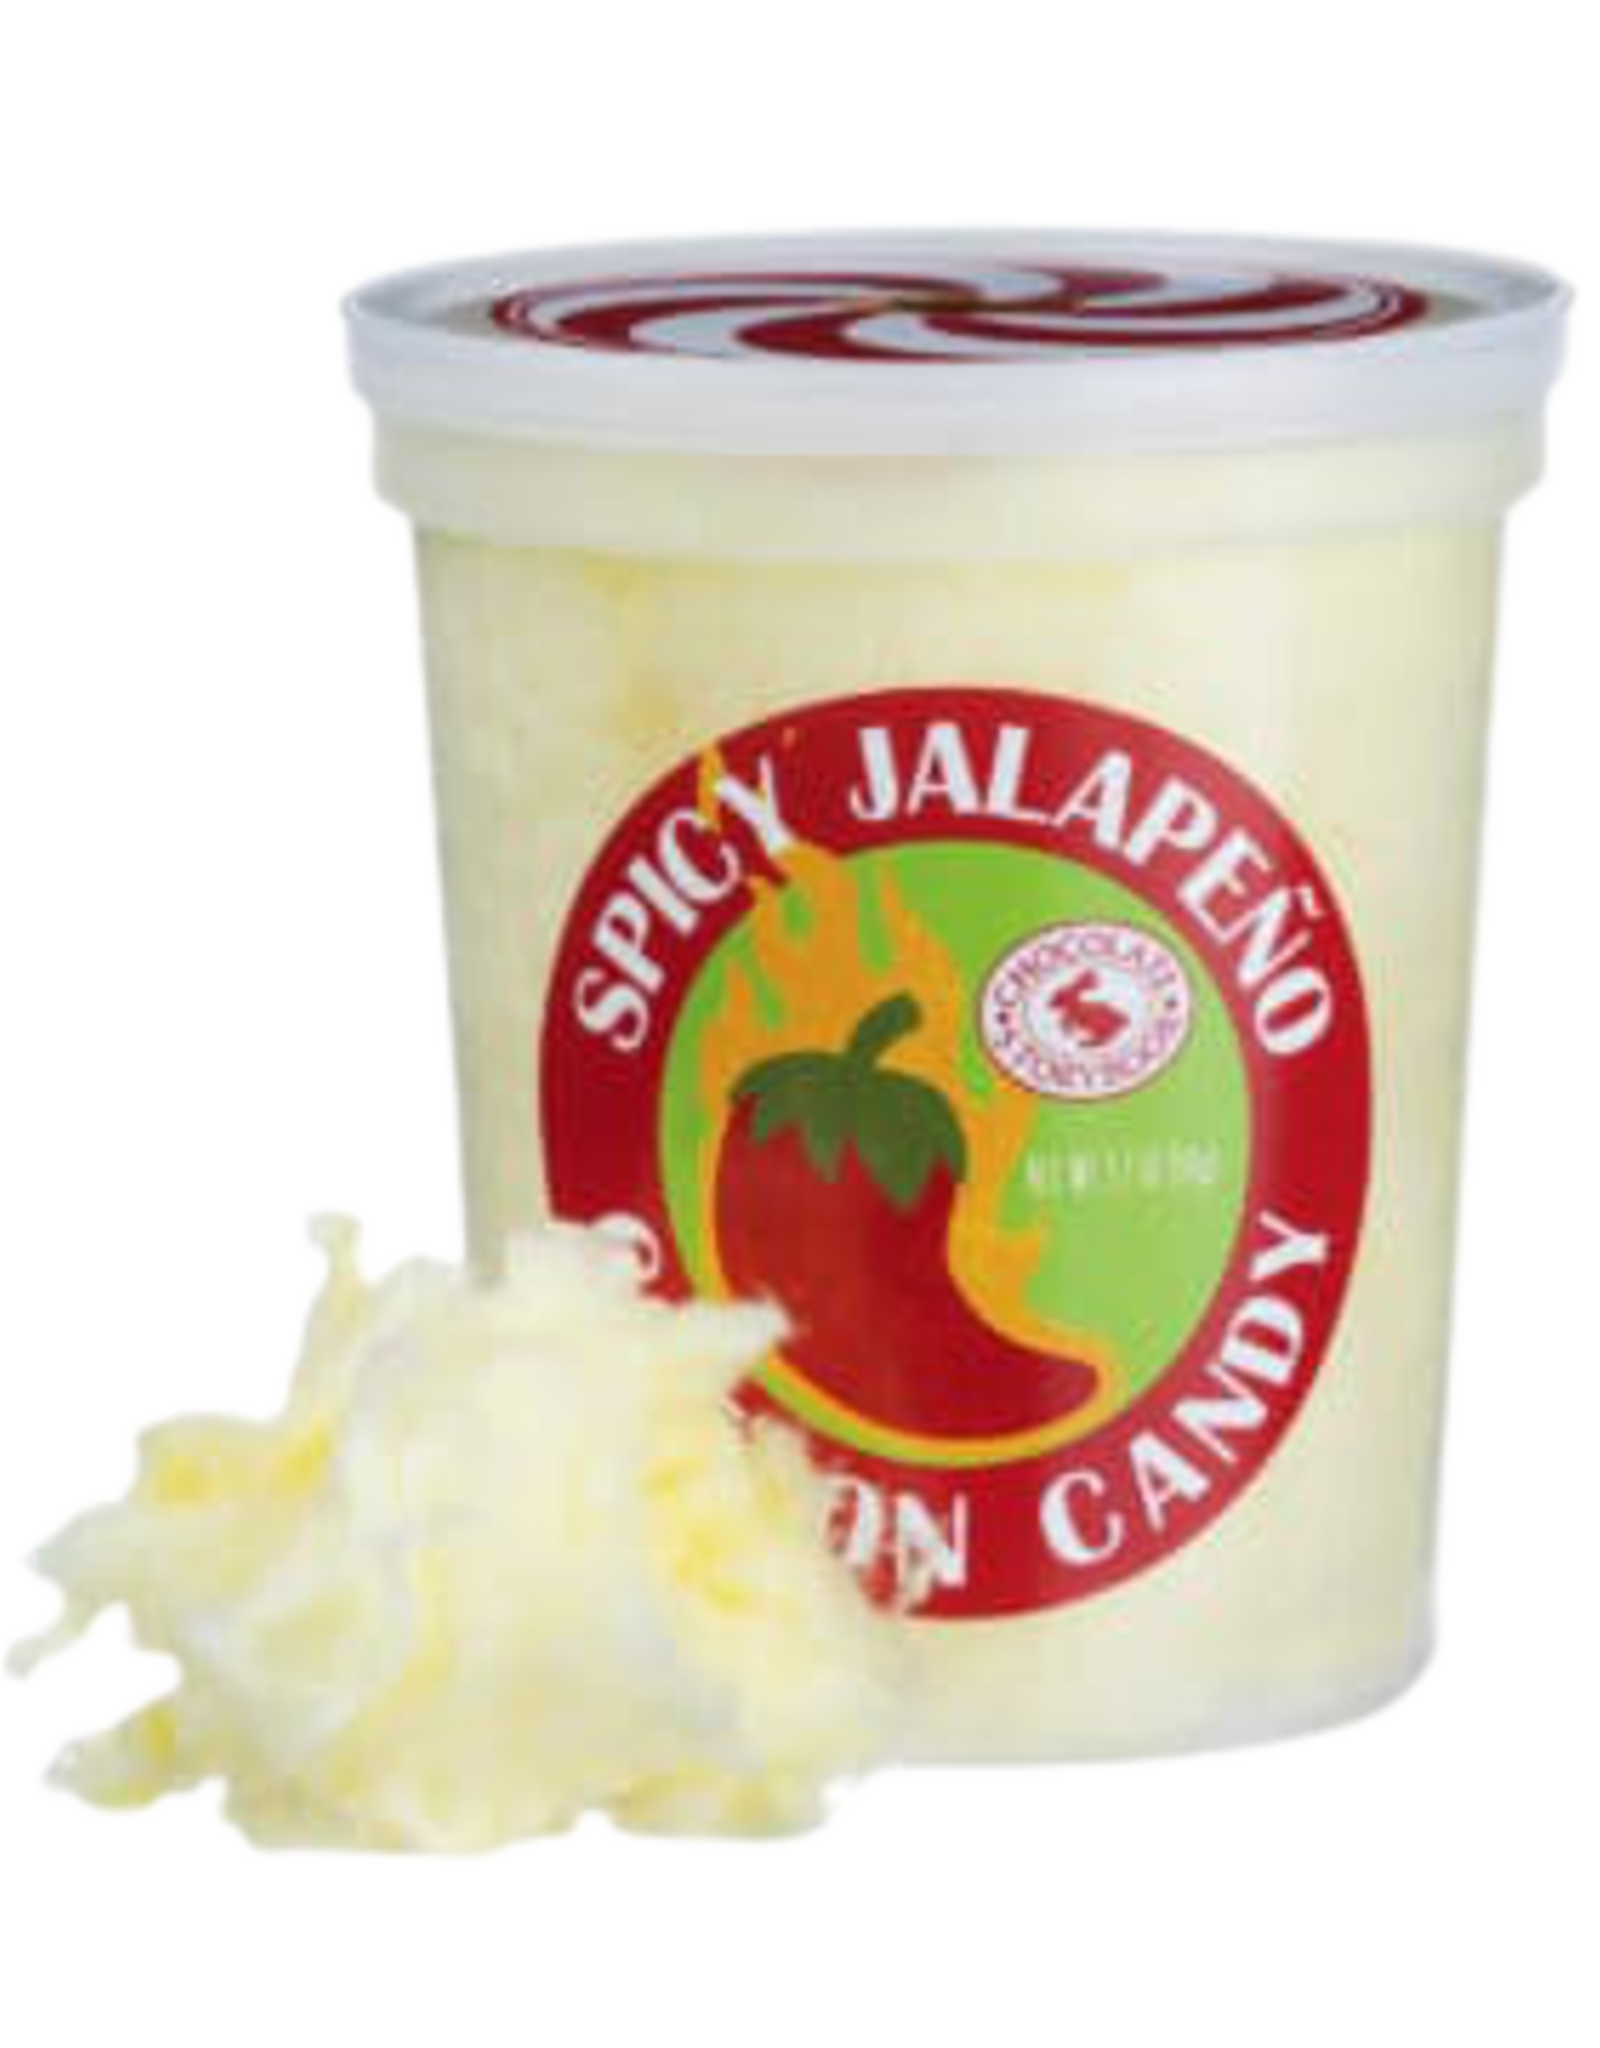 Cotton Candy Jalapeno